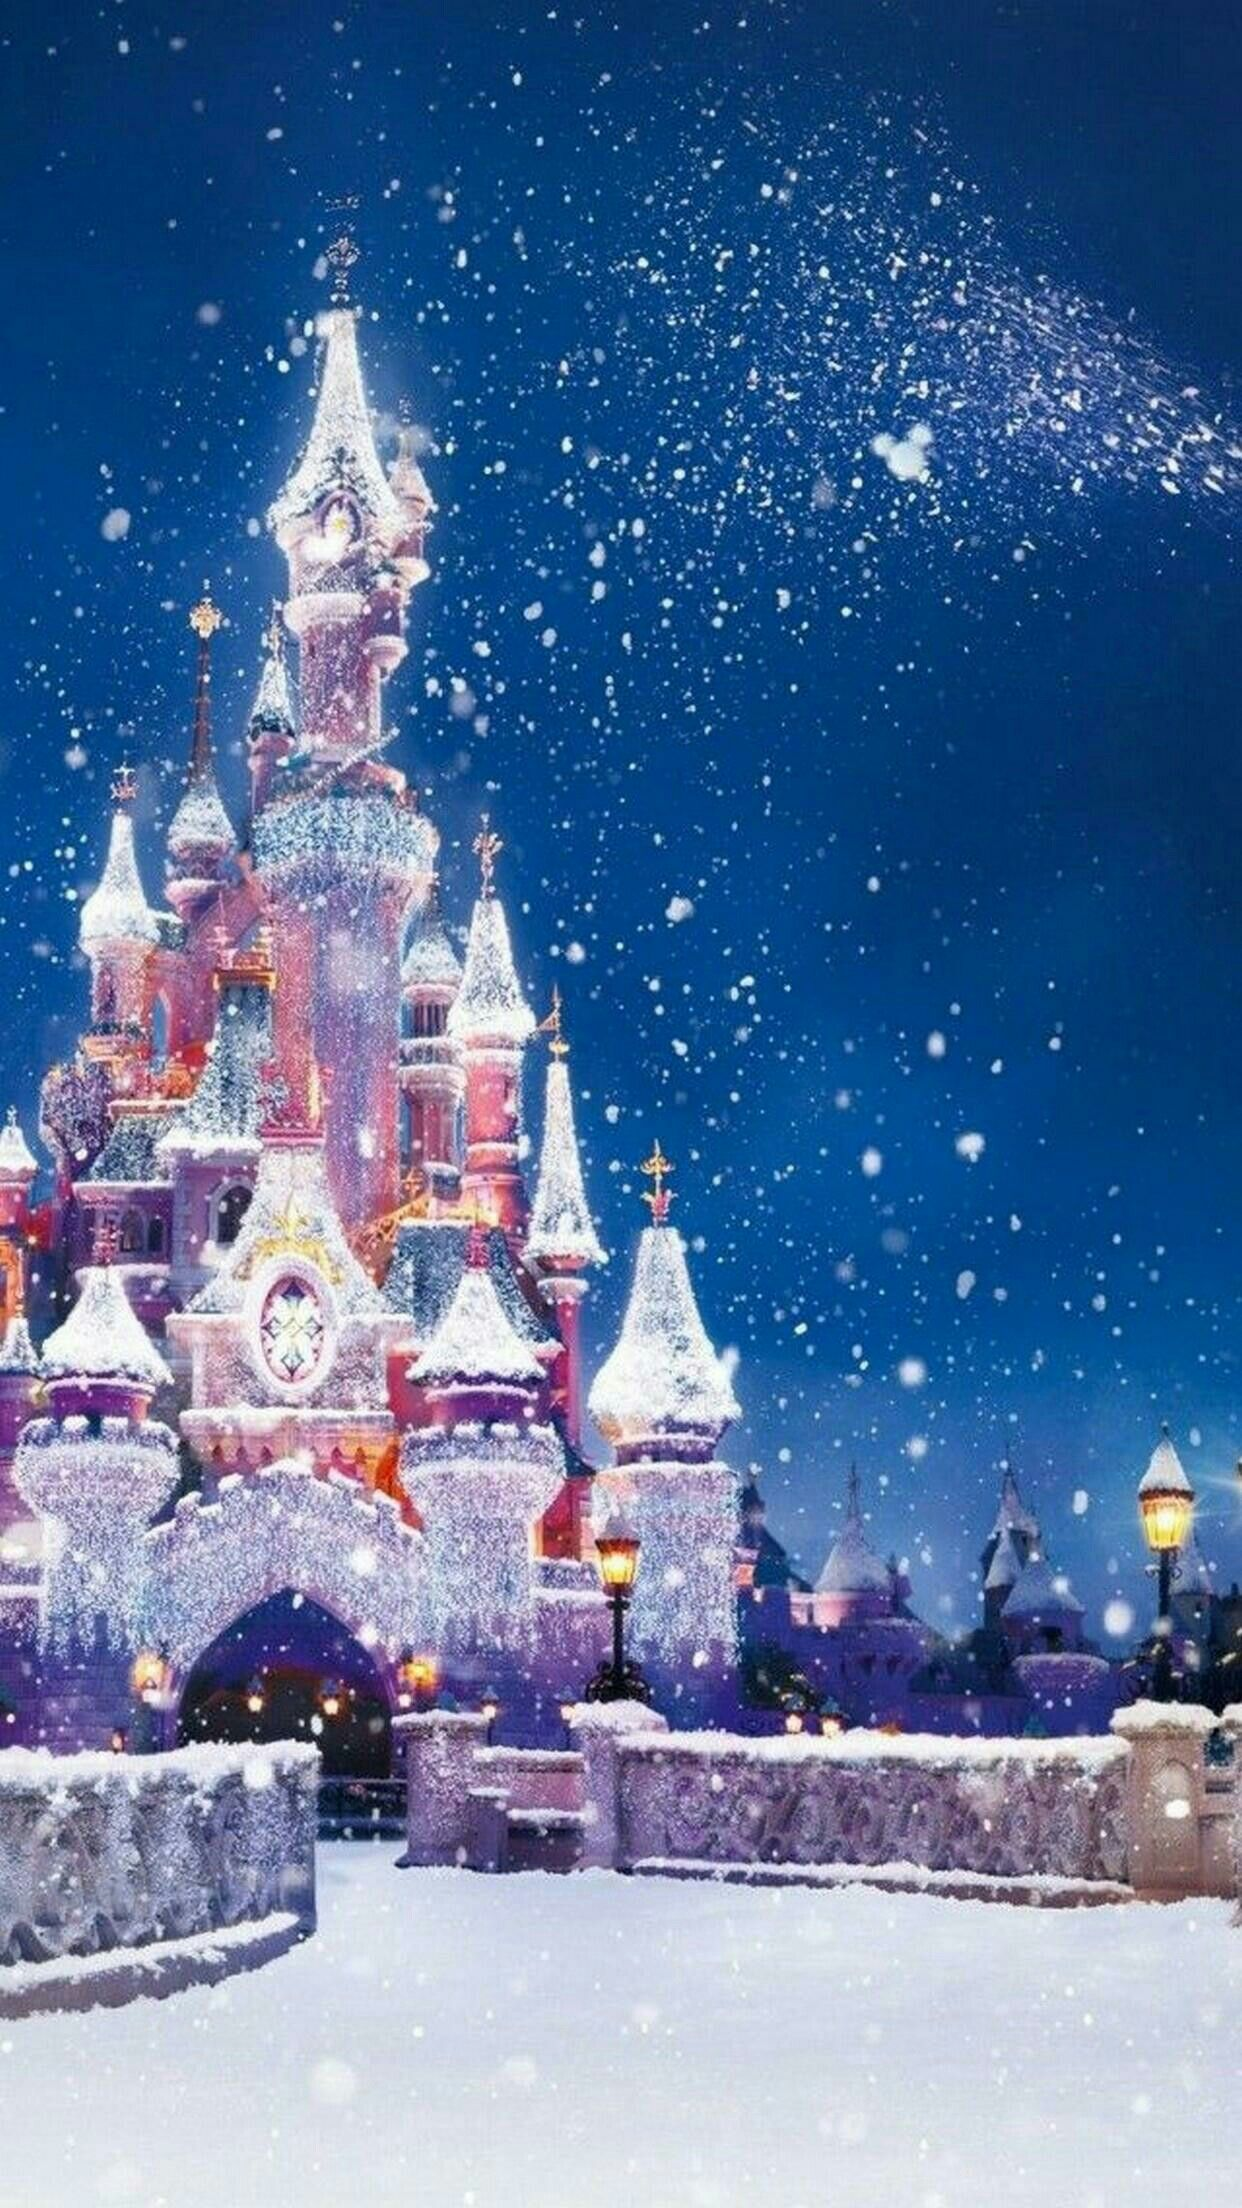 Chateau Disney Sous La Neige Fond Ecran Noel Fond D Ecran De Telephone Disney Papier Peint Disney